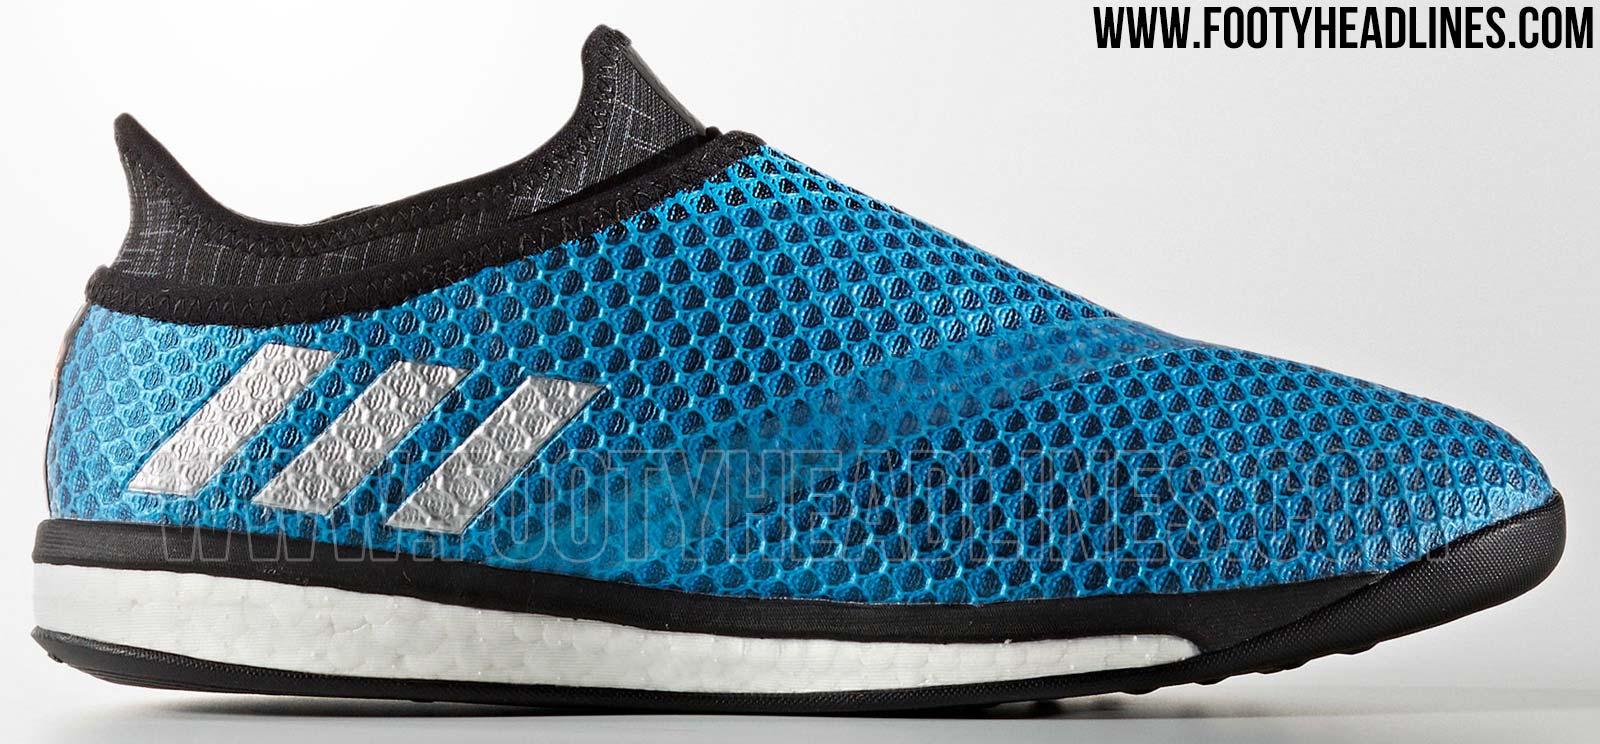 Adidas Boost Hallenschuh